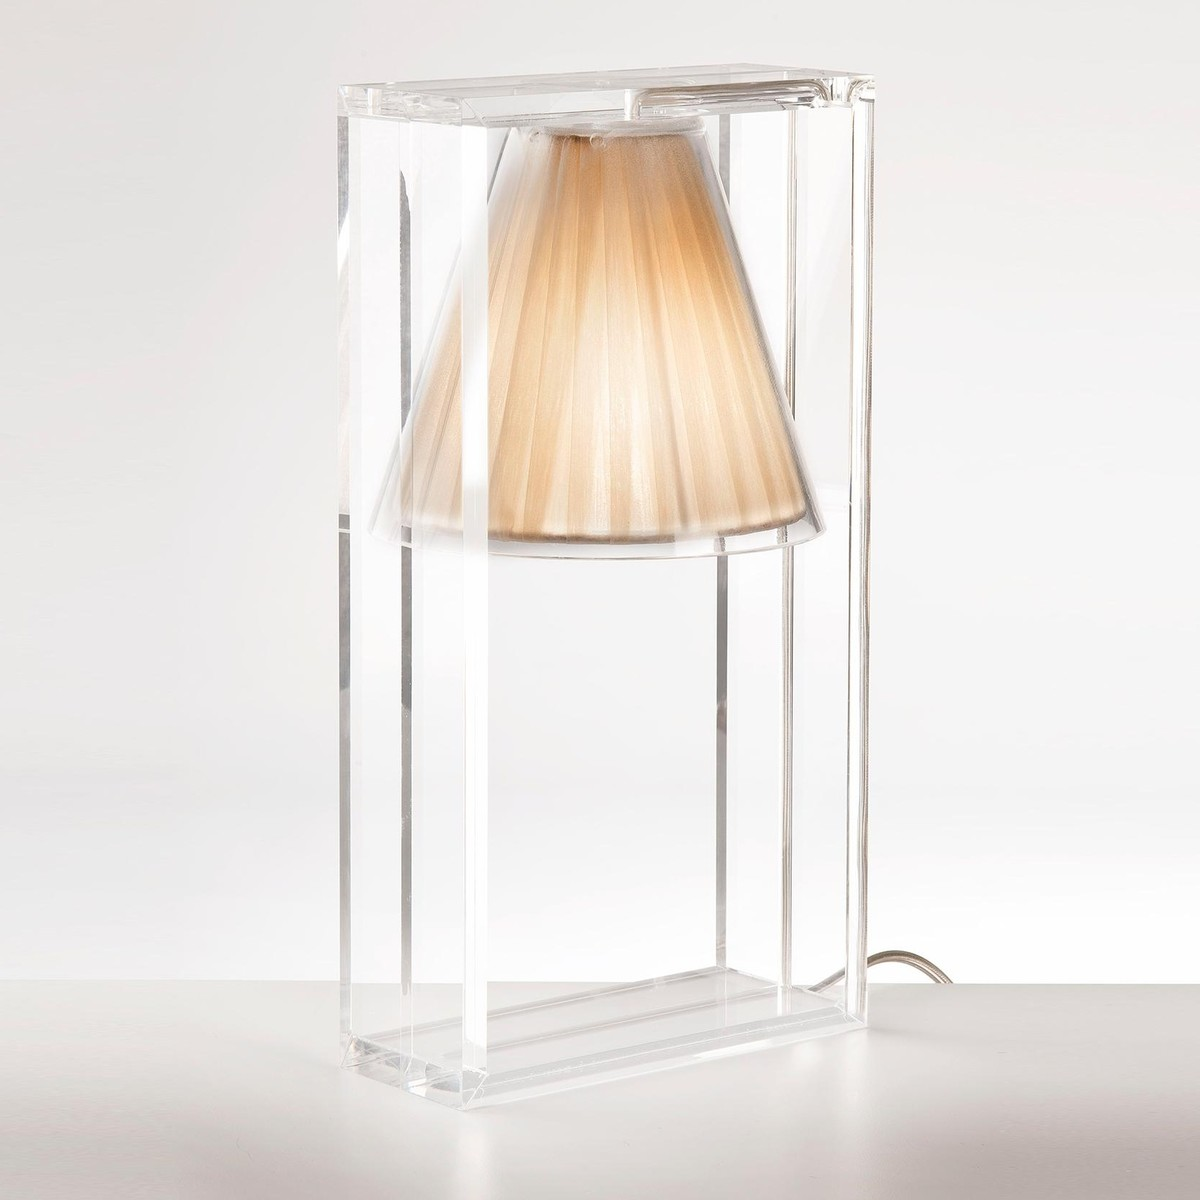 Light-Air - Lampe de table abat-jour tissu  Kartell  AmbienteDirect.com